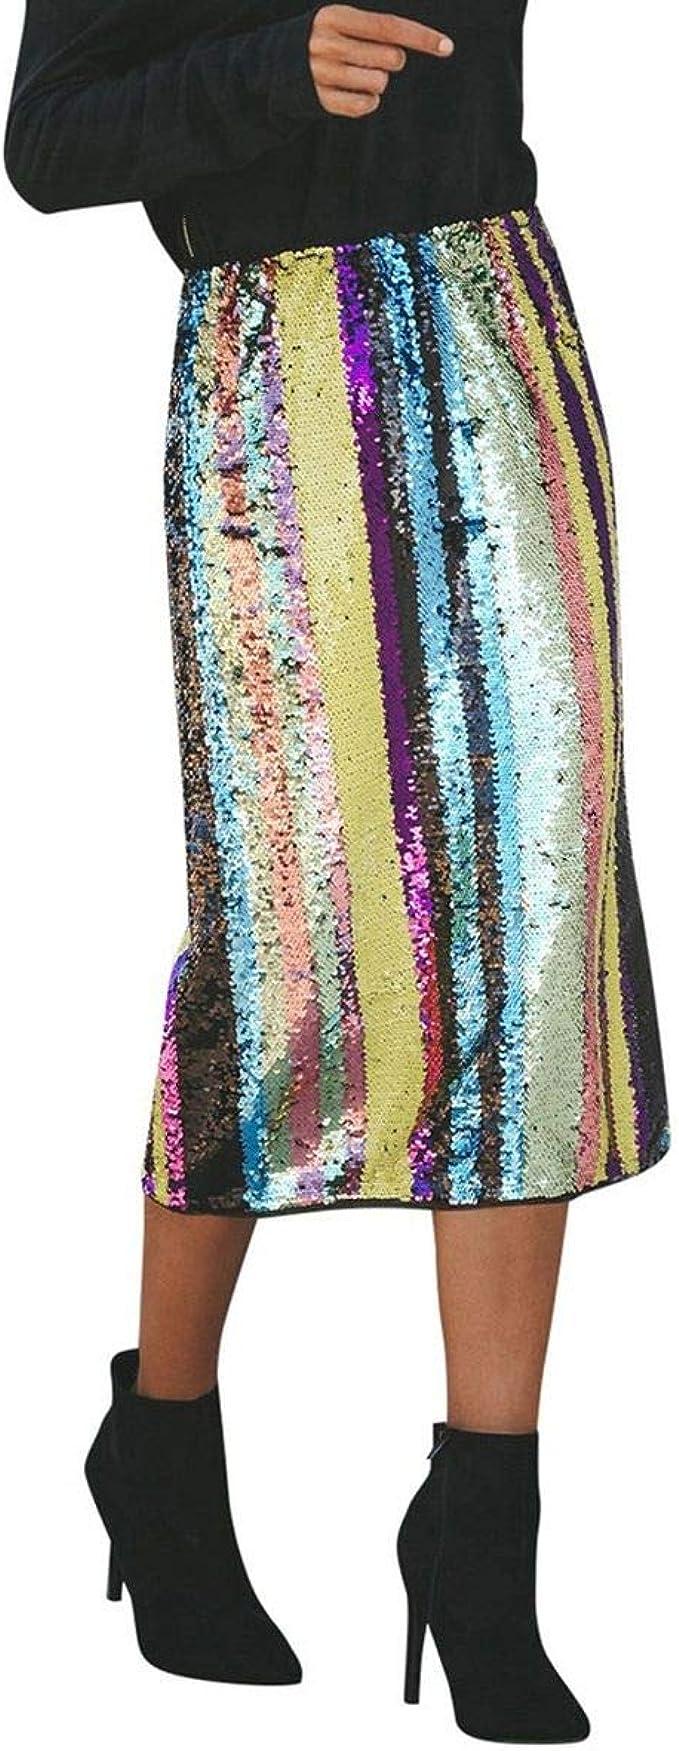 New Ladies Rainbow Print Striped Maxi Multi Color Full Length Women Tube Skirt